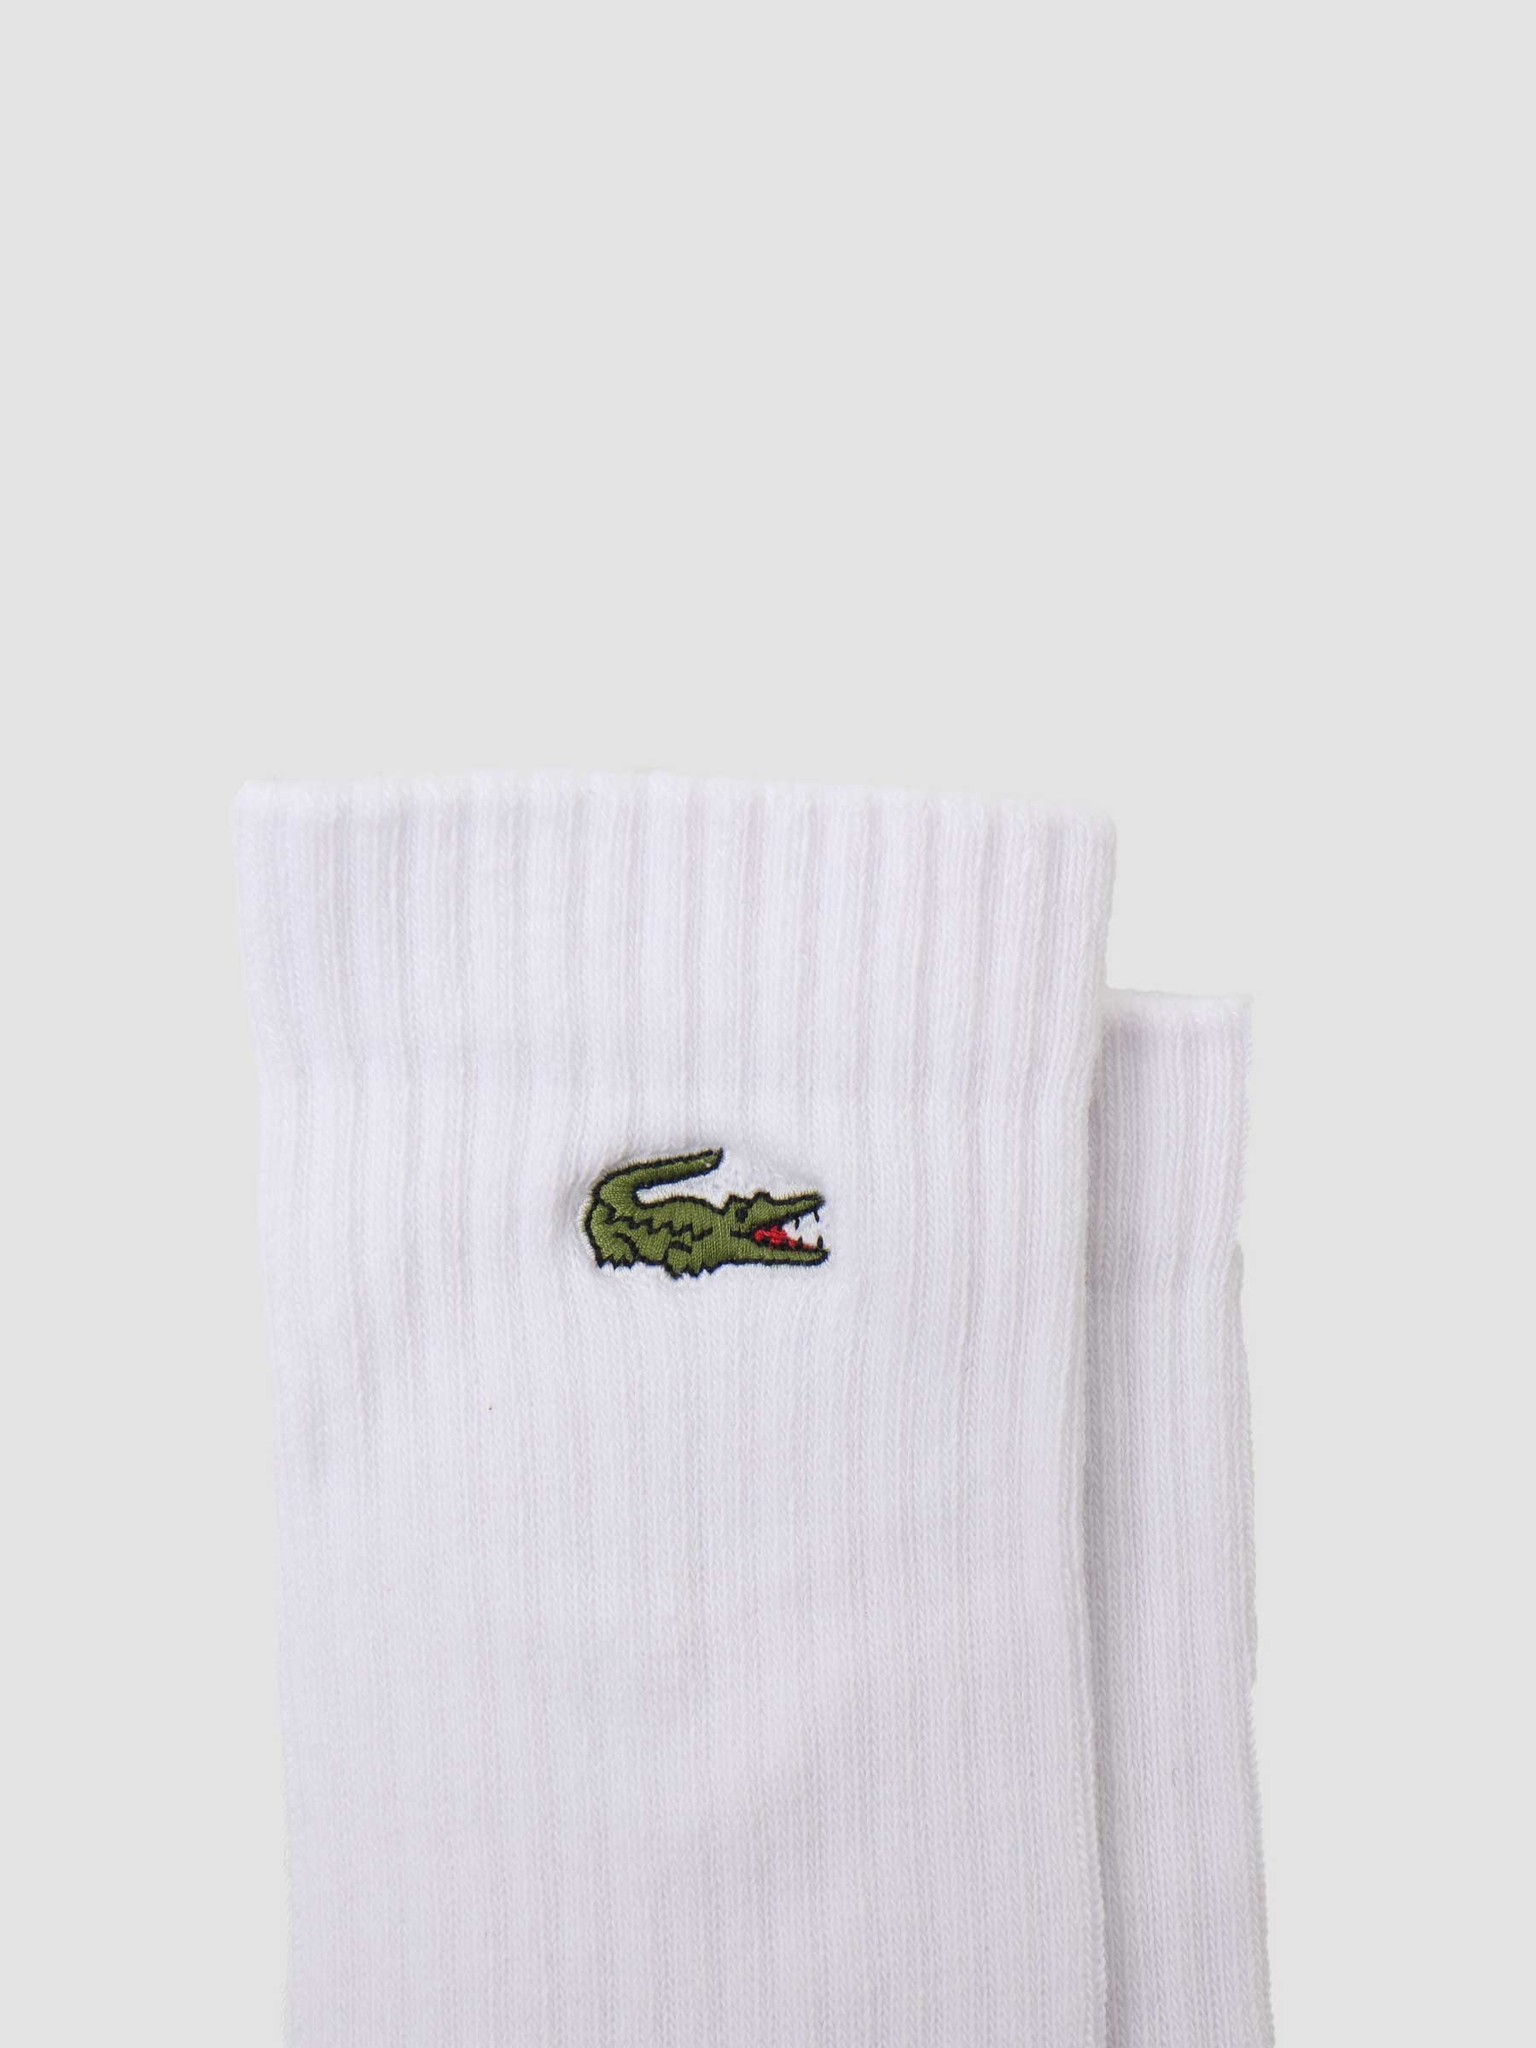 Lacoste Lacoste 2G1C Socks 11 Silver Chine White Black RA2099-11